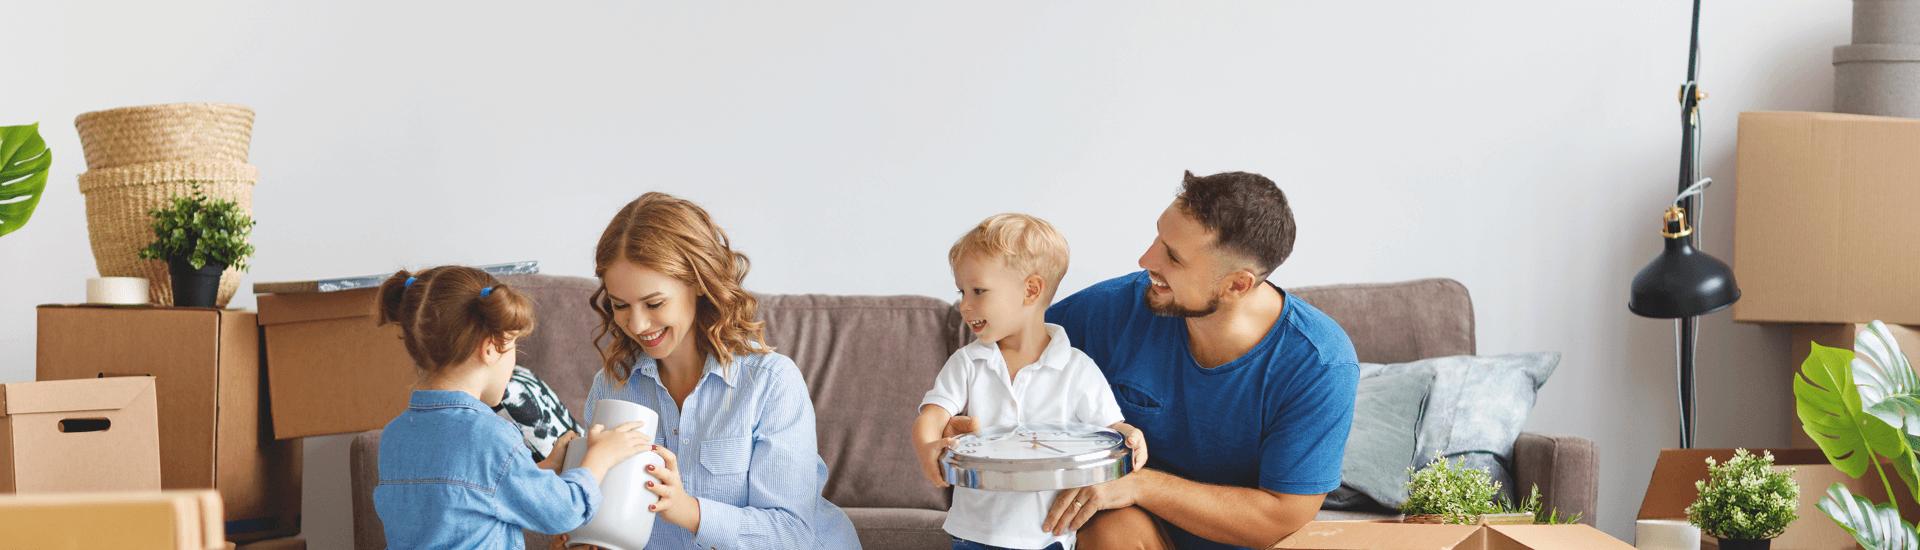 immobilienfinanzierung-familie-packt-zusammen-teil-1